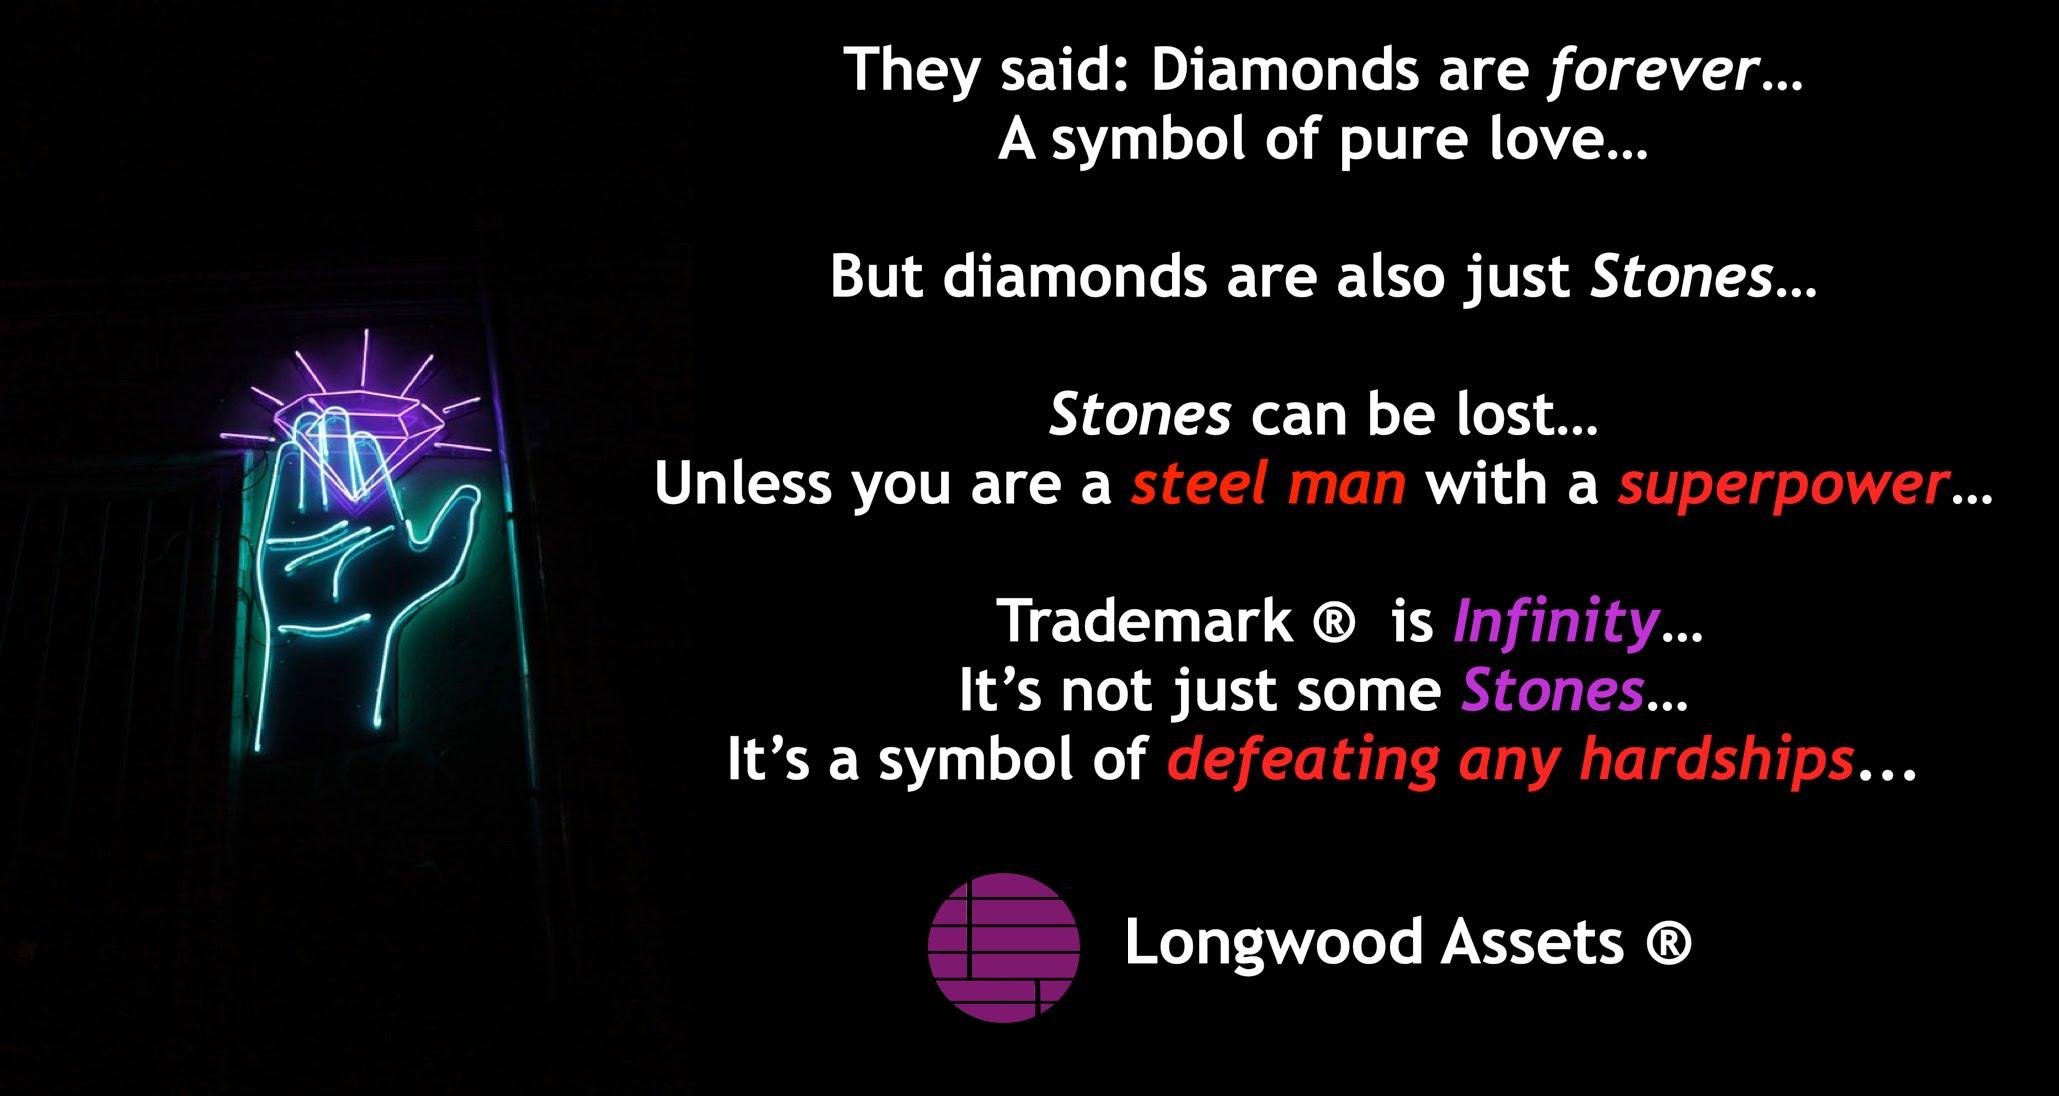 Trademark Infinity Stones